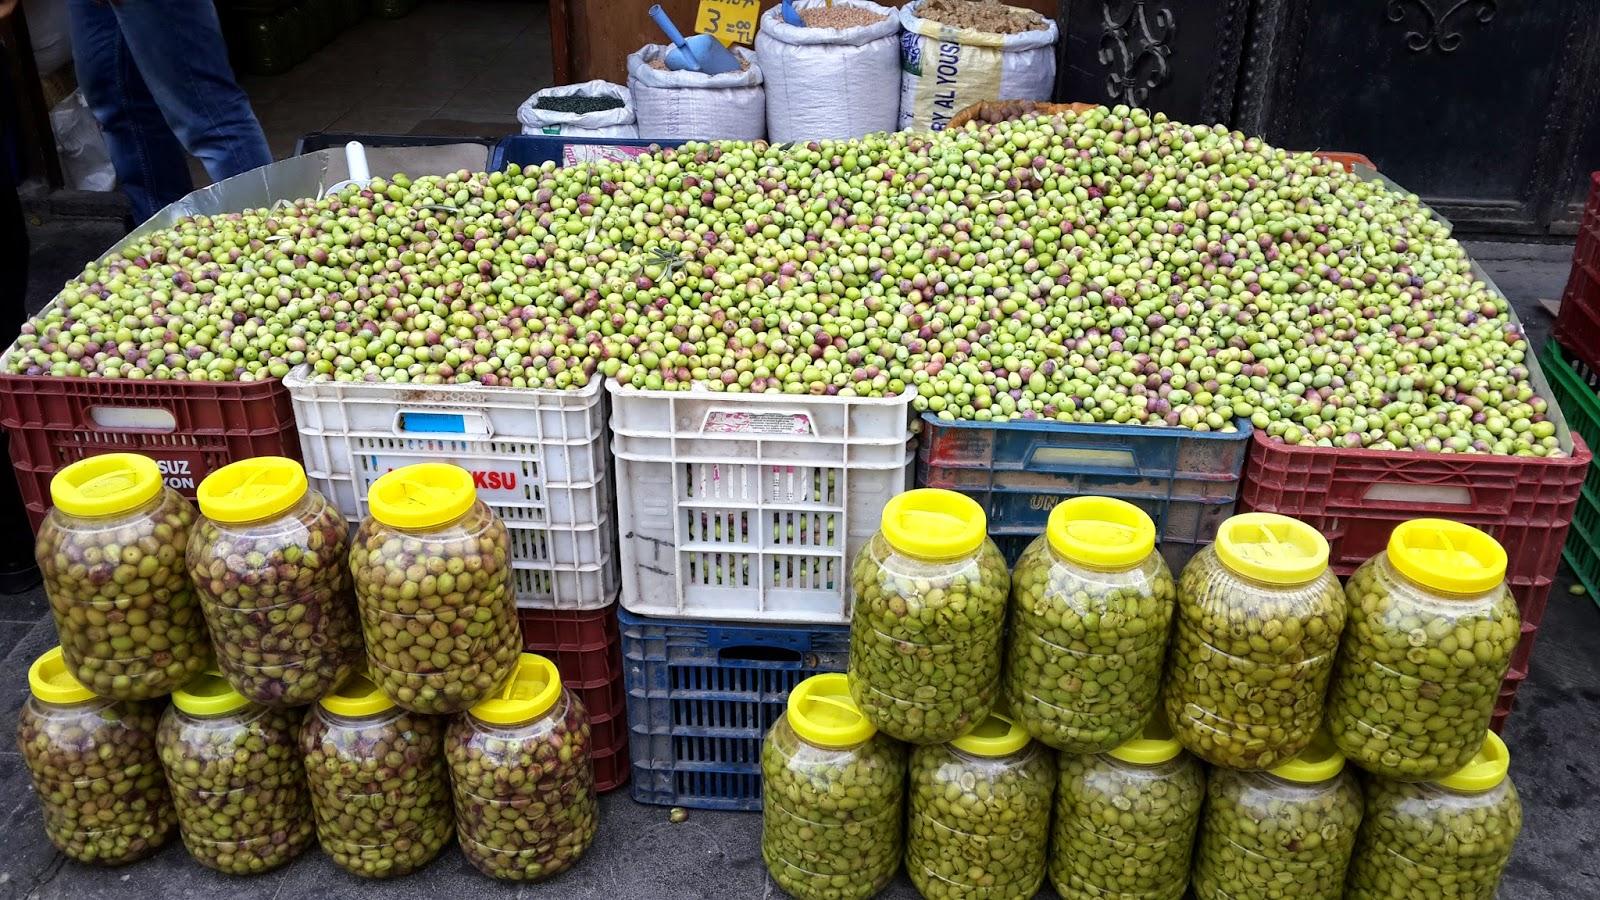 Gaziantep, zeytin, yeşil zeytin, pazar, zeytin pazarı, stant